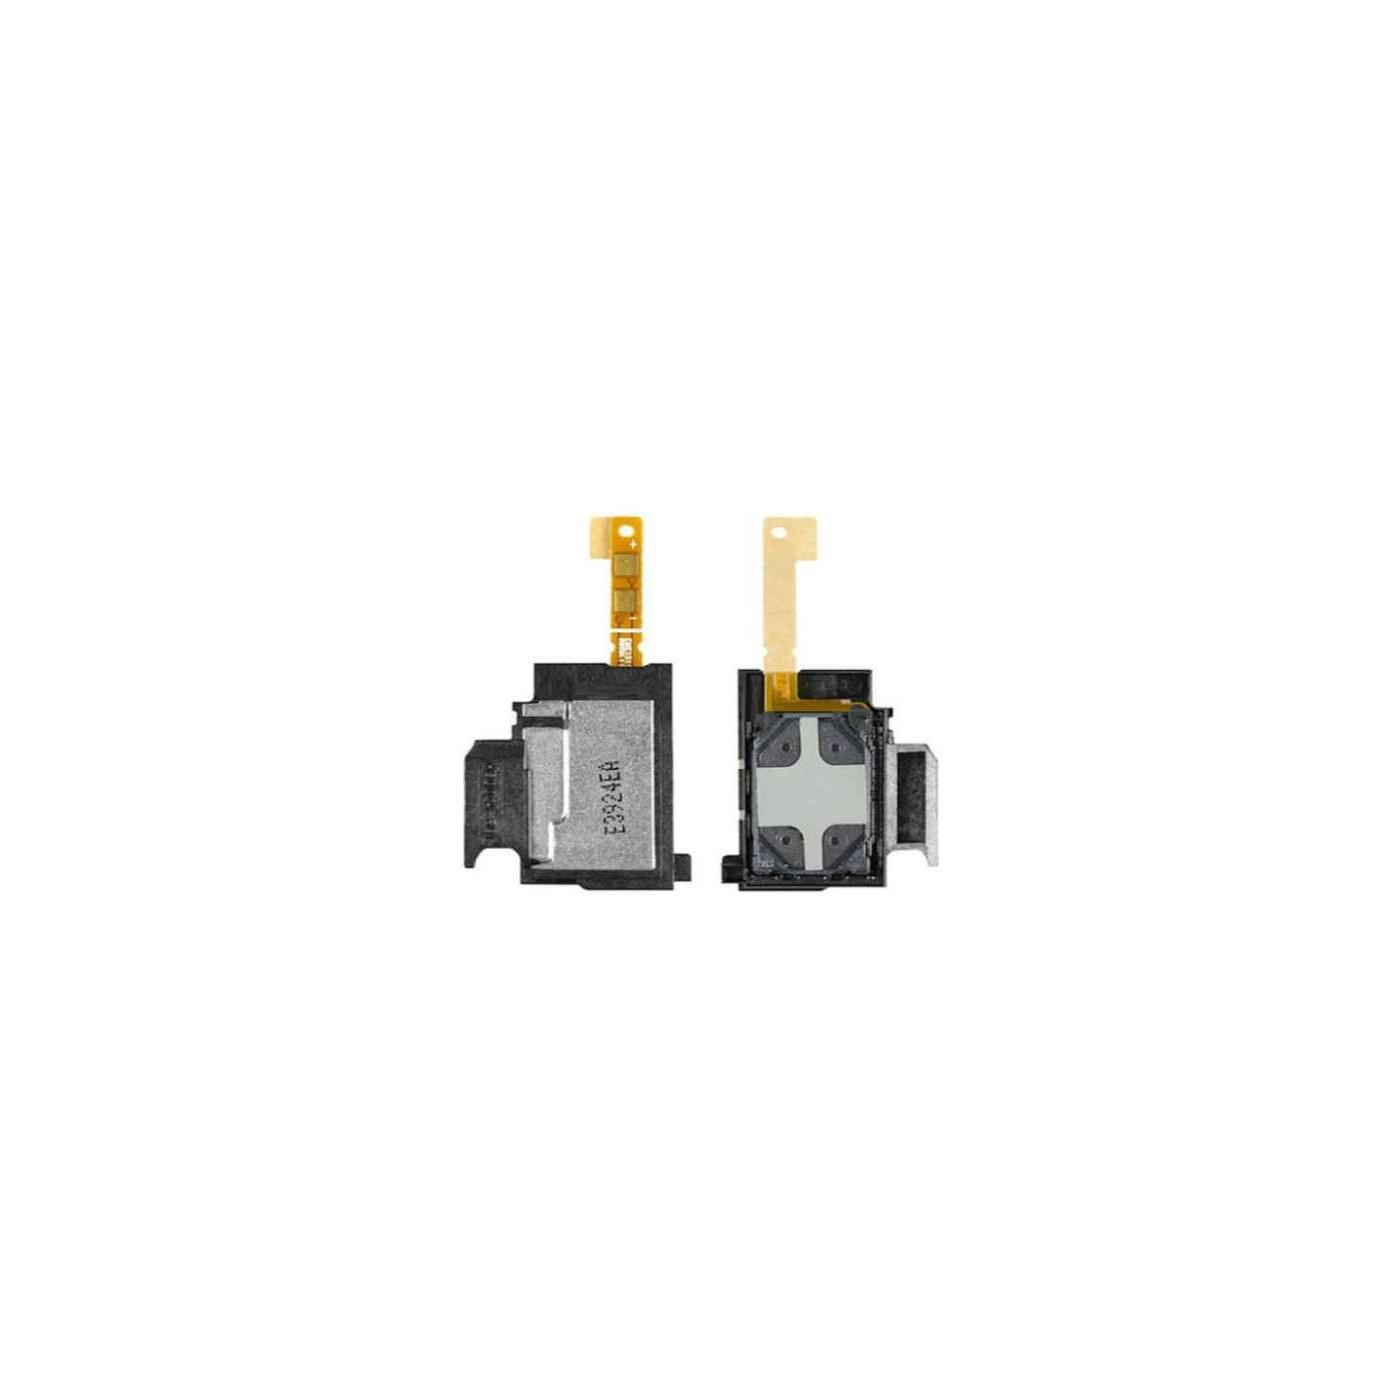 Flat altoparlante suoneria per samsung n9005 galaxy note3 speaker vivavoce